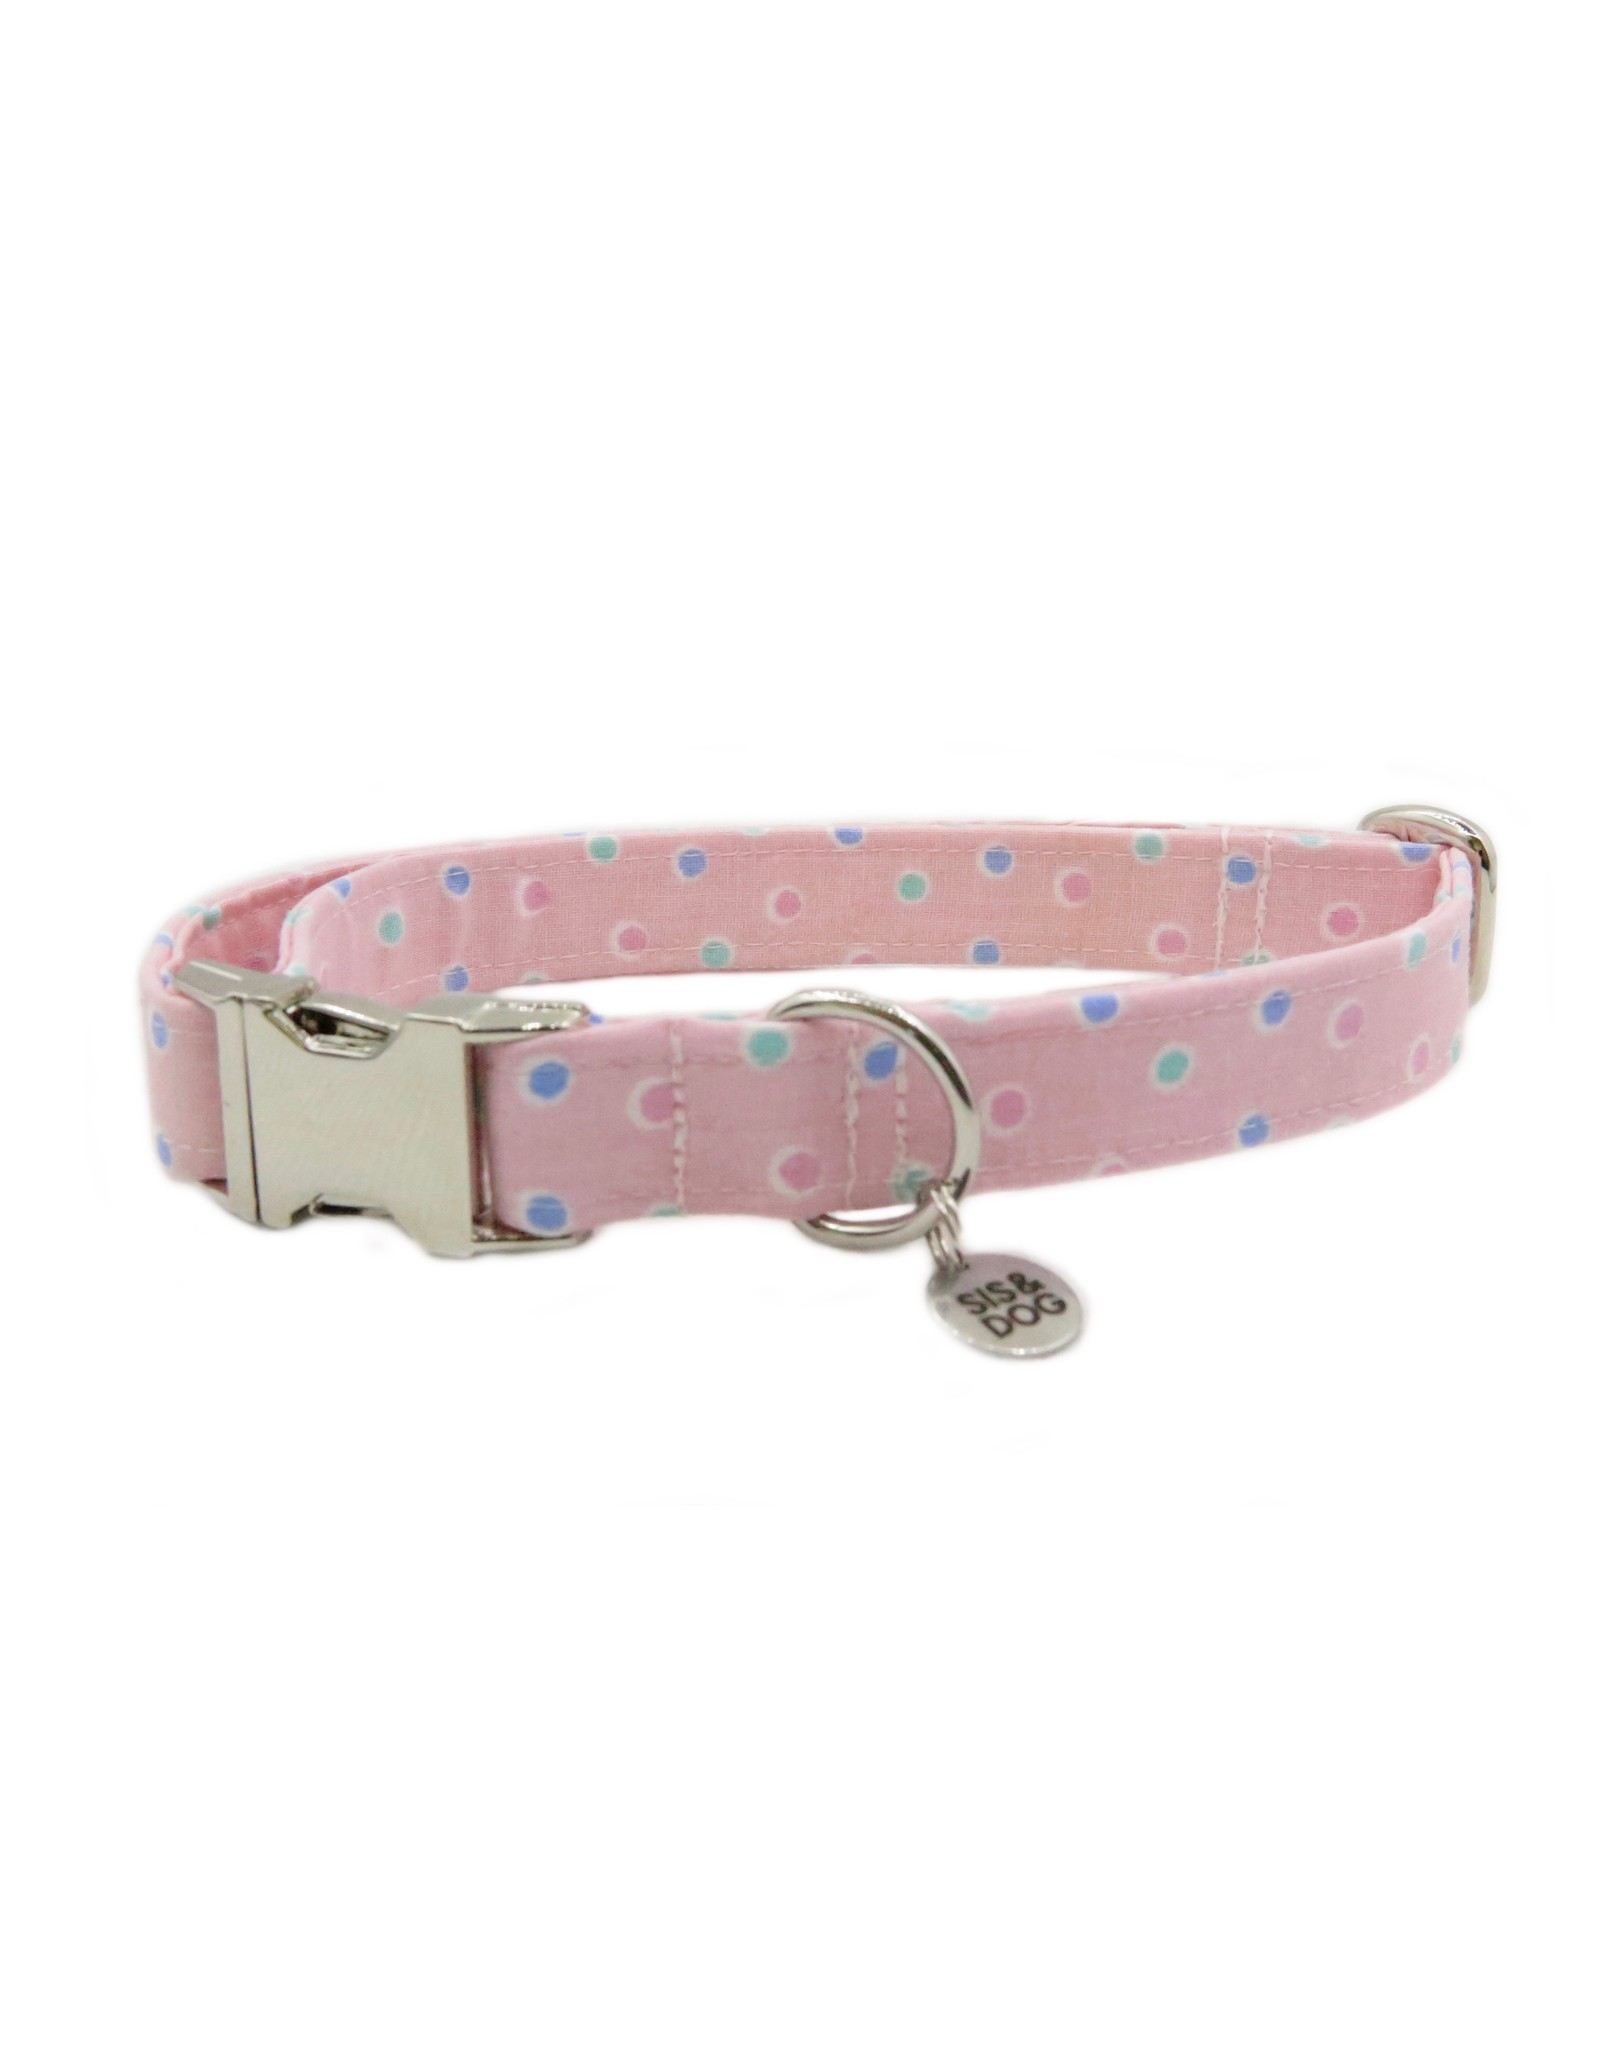 Dolly collar